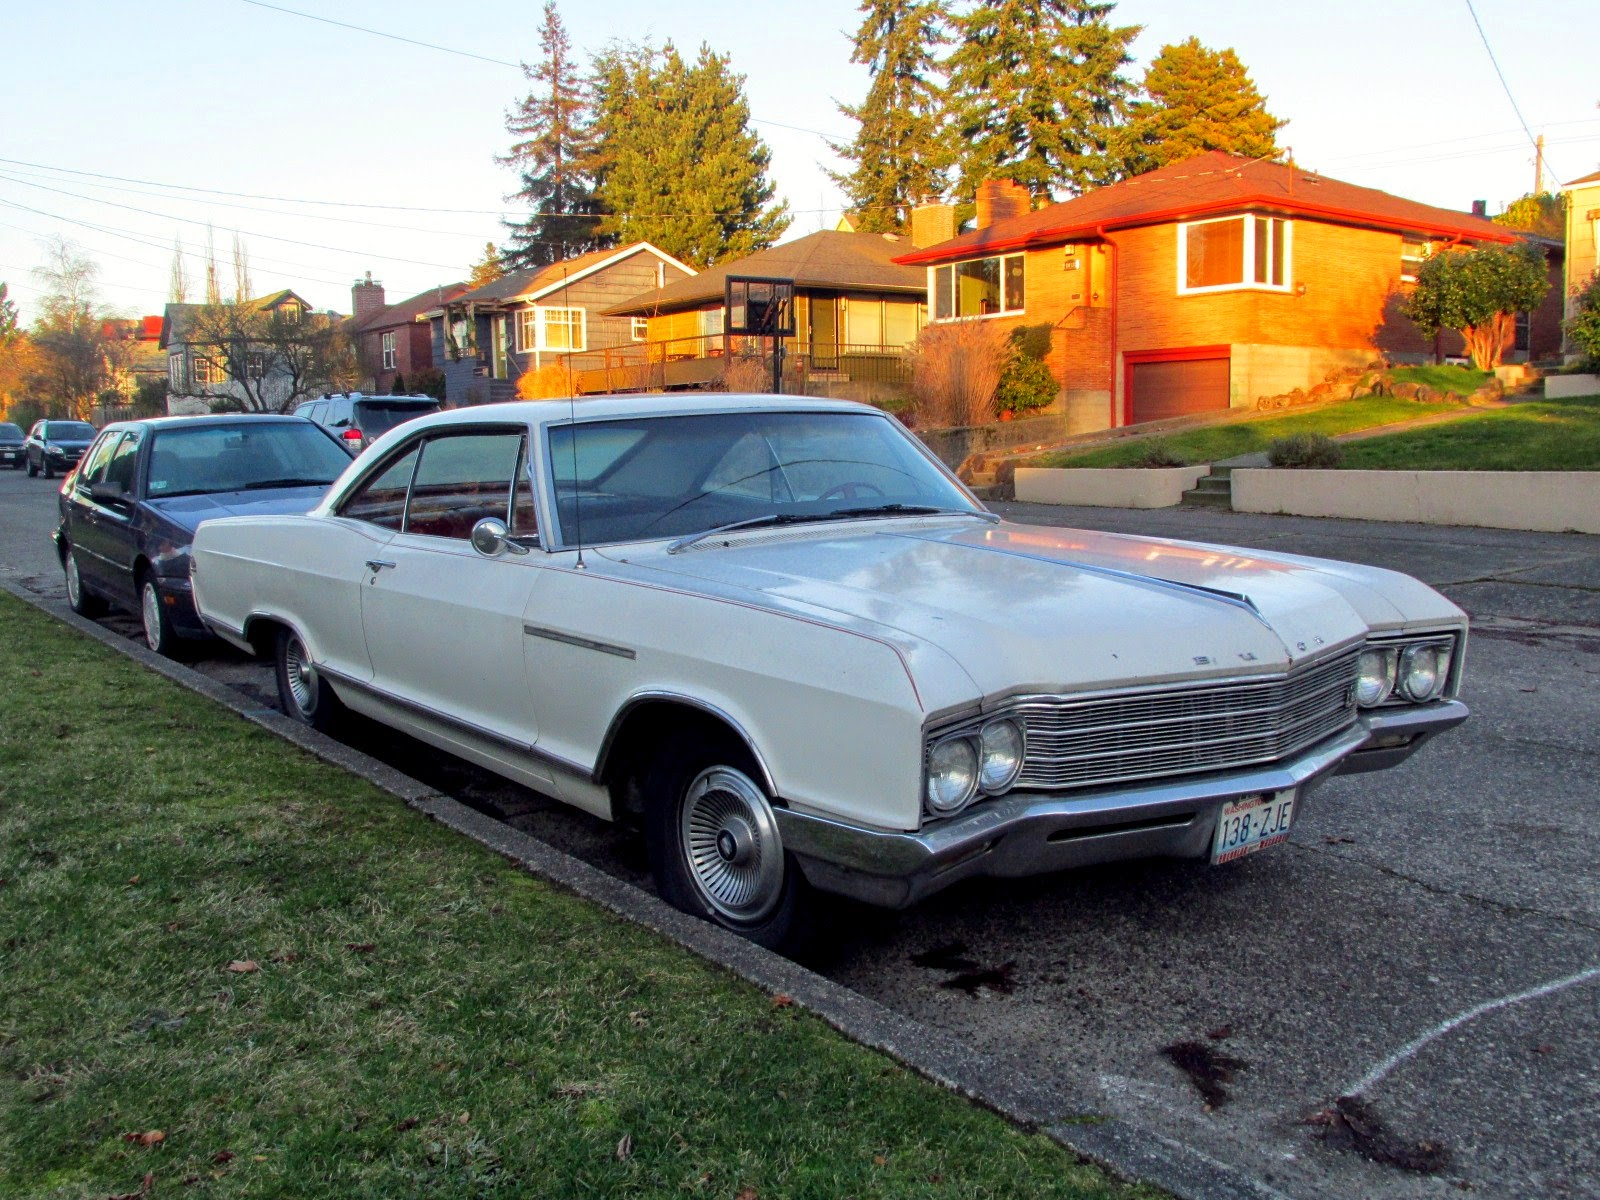 Seattle's Classics: 1965 Buick LeSabre